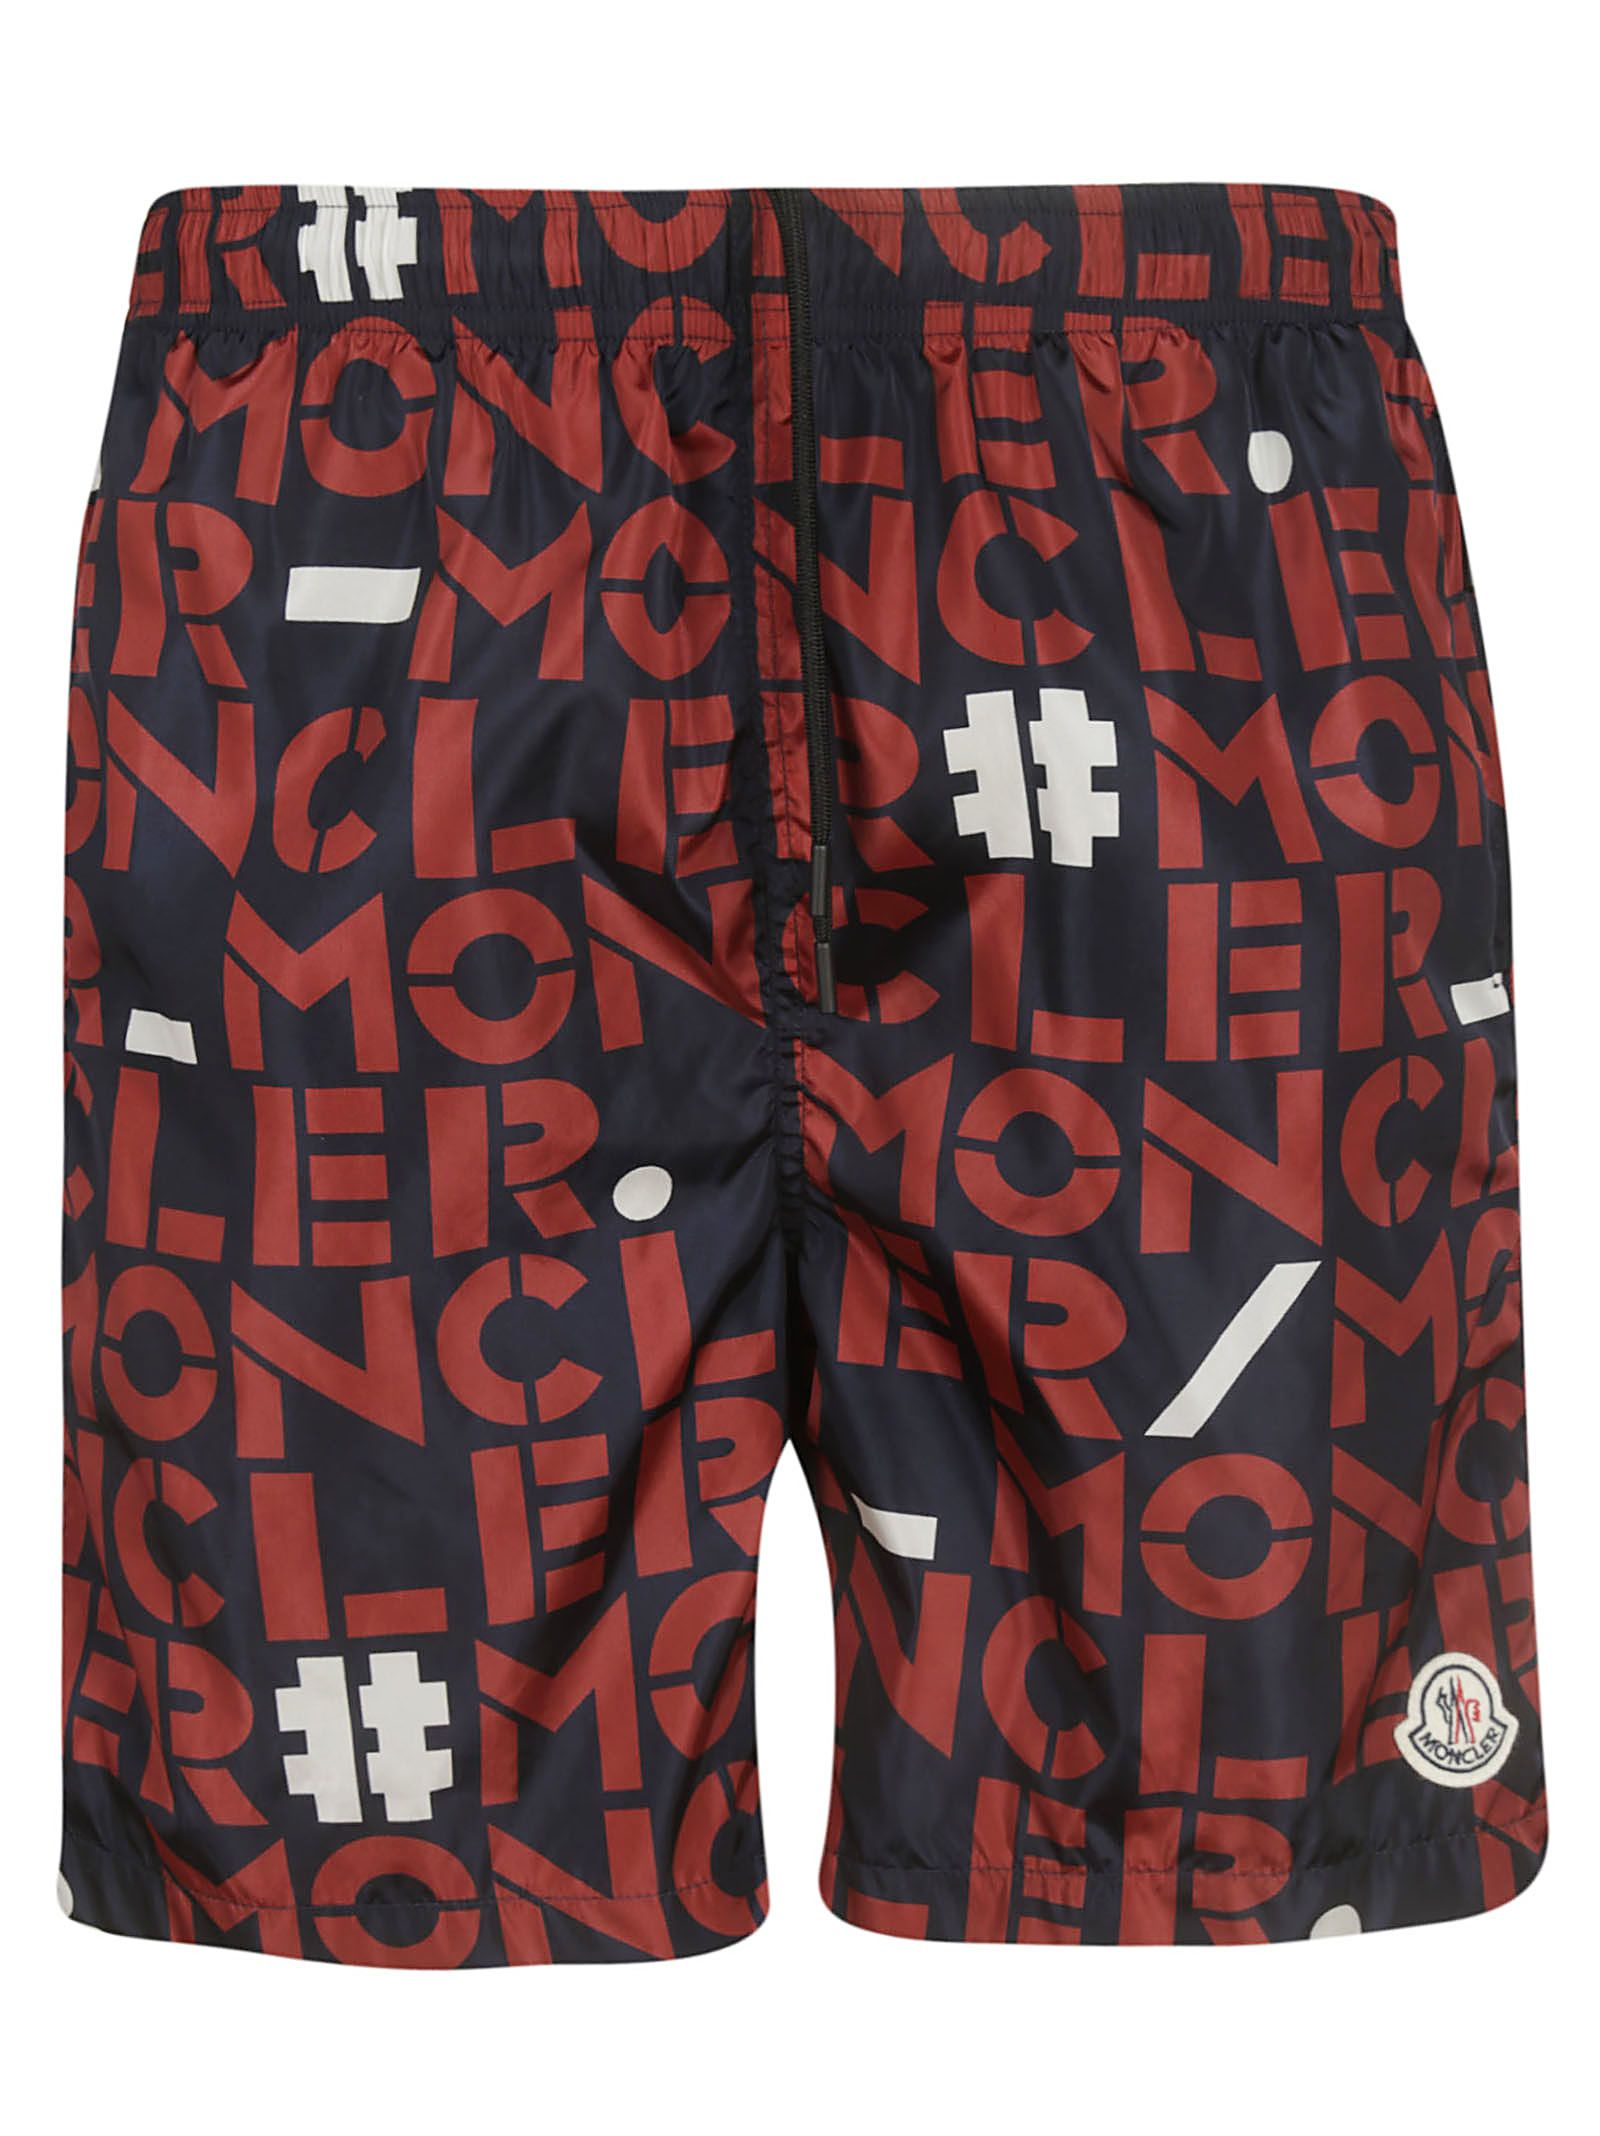 5de37b066a Moncler Moncler Printed Logo Swim Shorts - red - 10930848 | italist